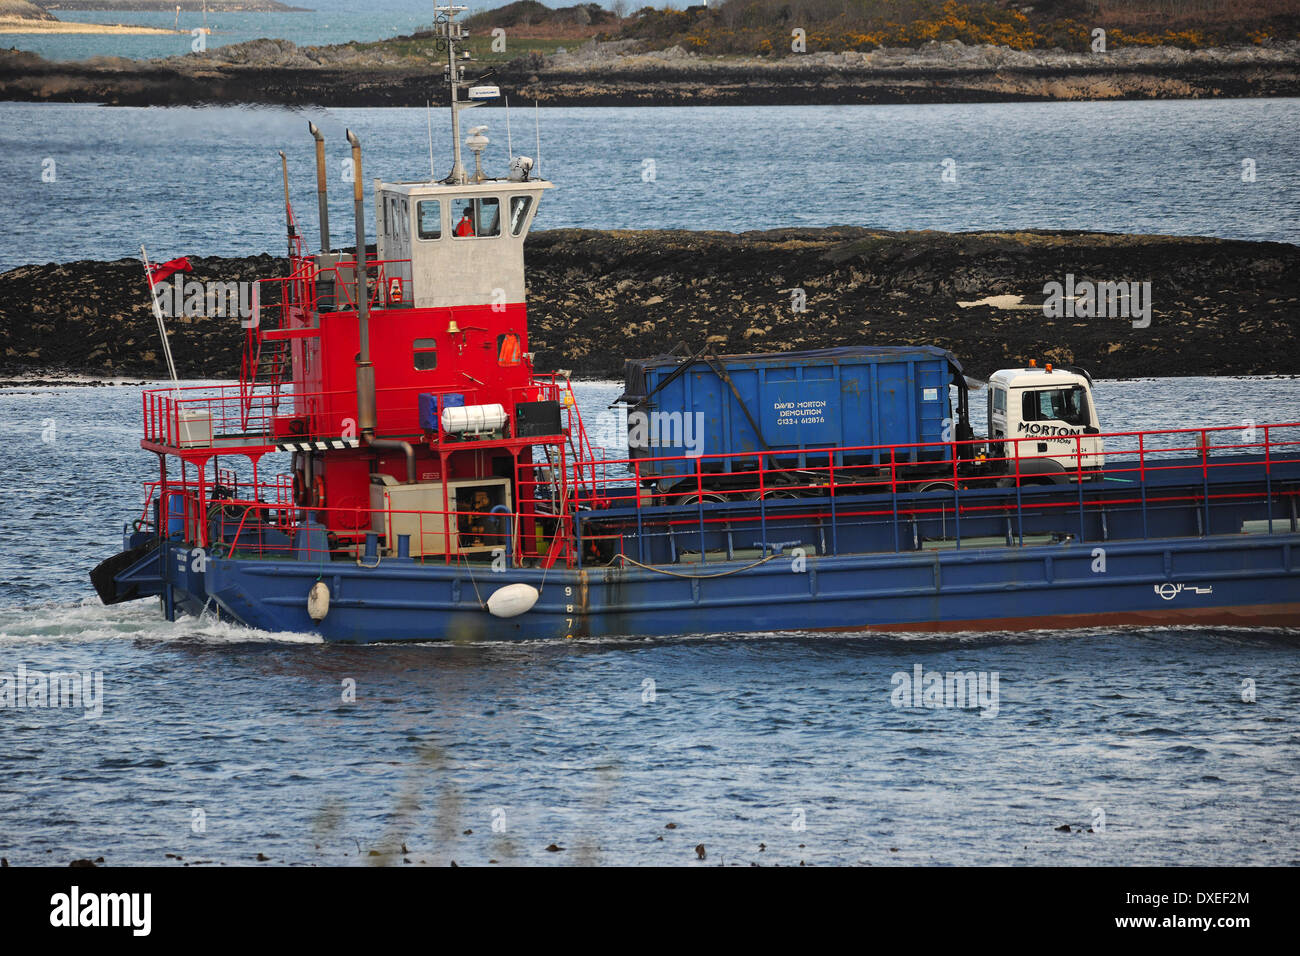 glensanda ferry photos & glensanda ferry images - alamy